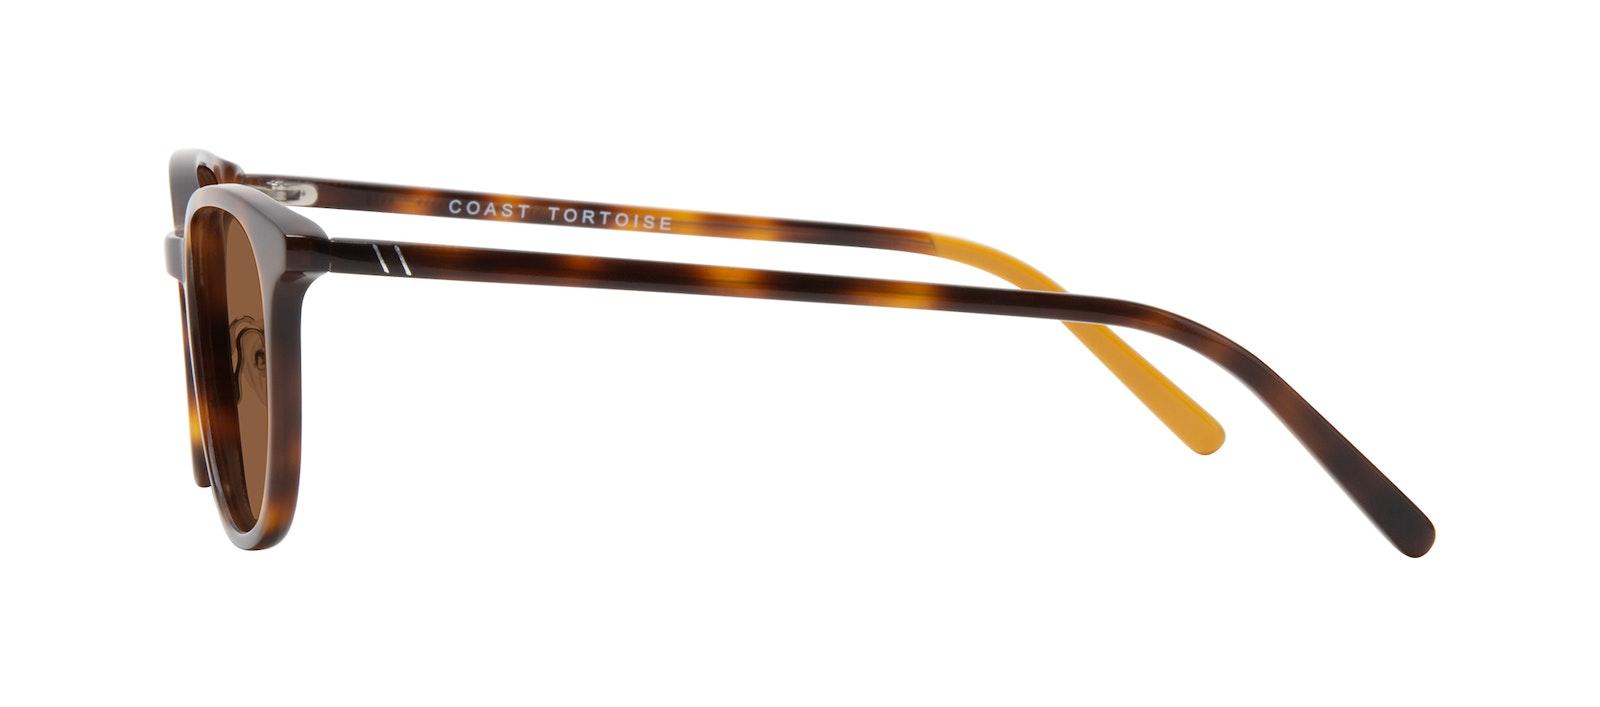 Affordable Fashion Glasses Round Sunglasses Men Coast Tortoise Side